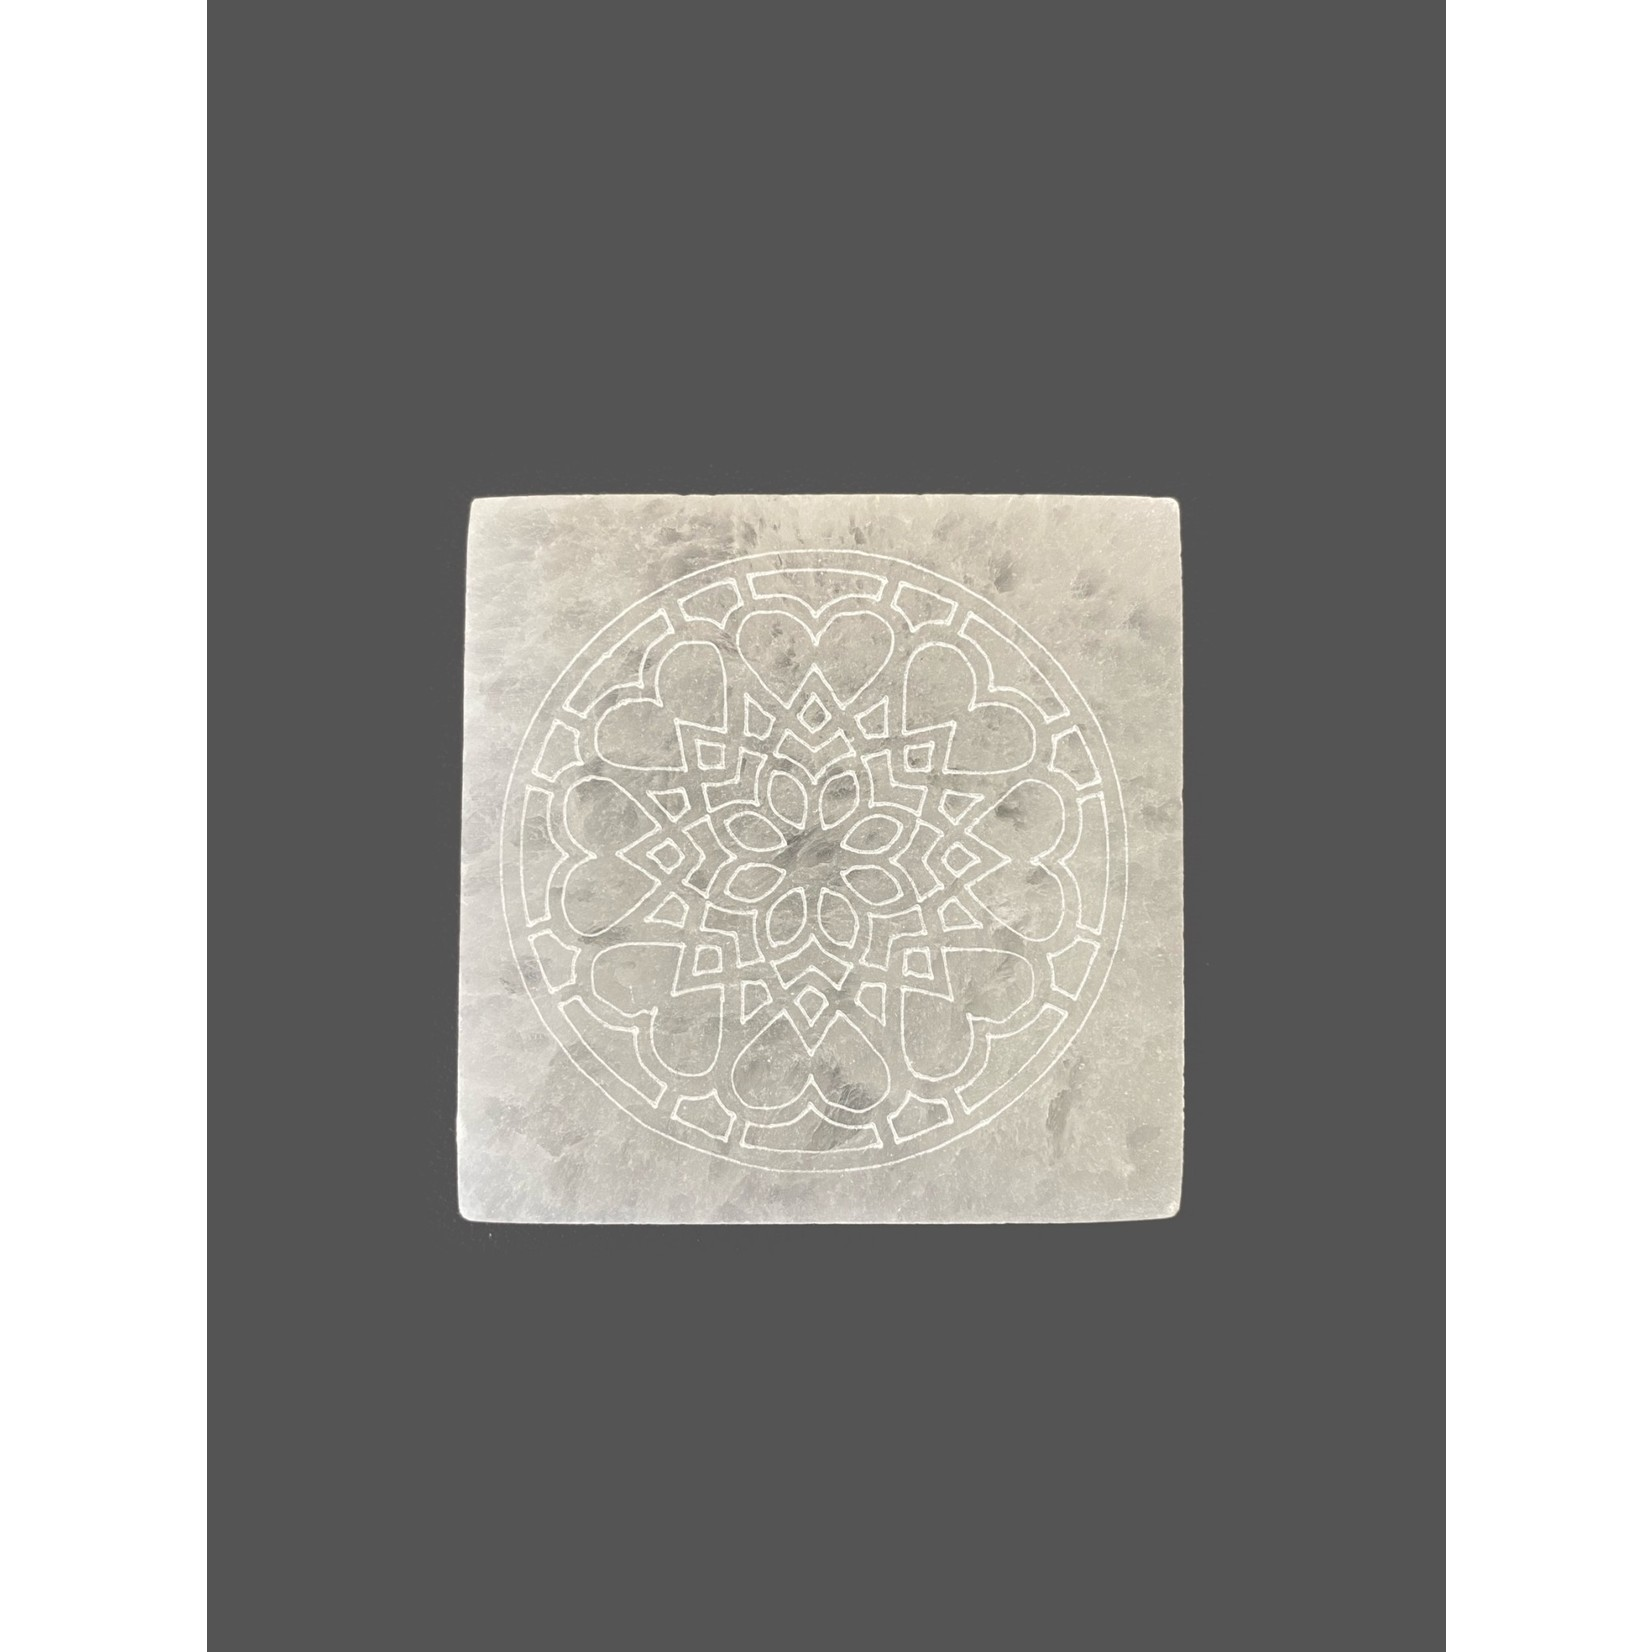 Placa de selenita grabada 7 cm